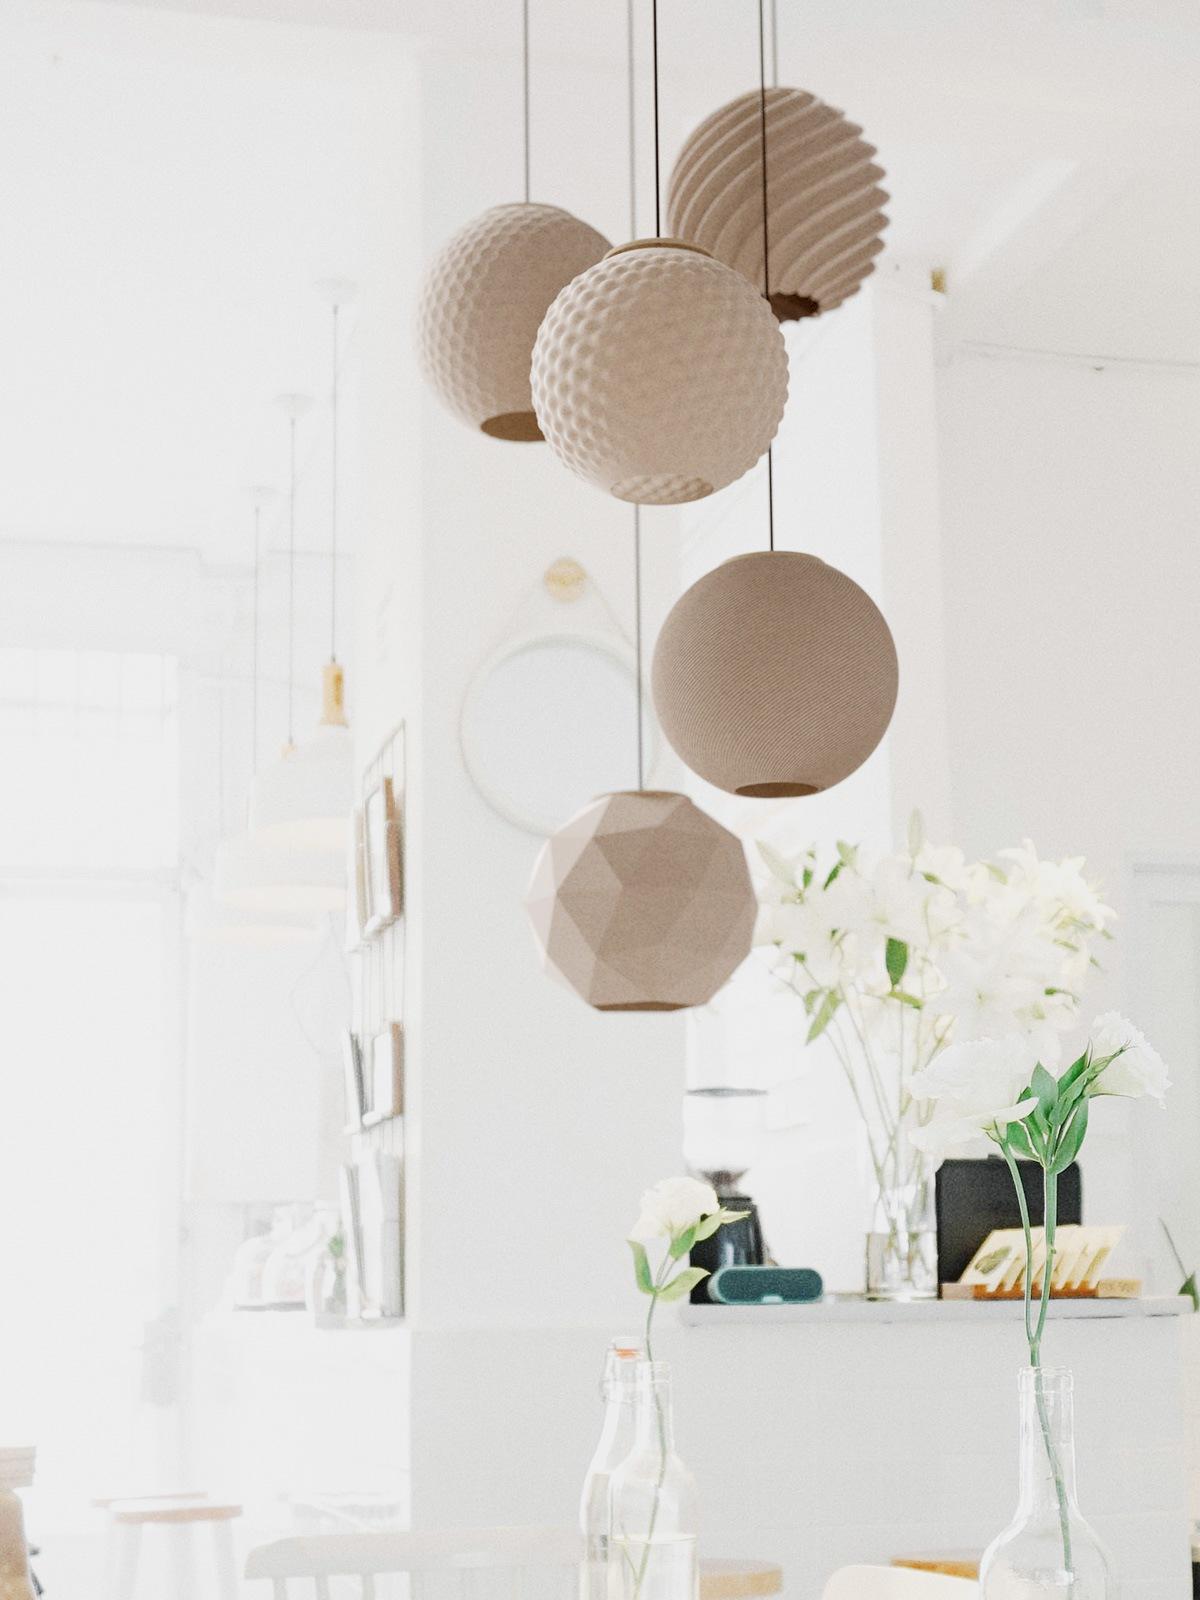 Polyluma Random Leuchten 3-D-Drucker Design Berlin DesignOrt Lampen Onlineshop